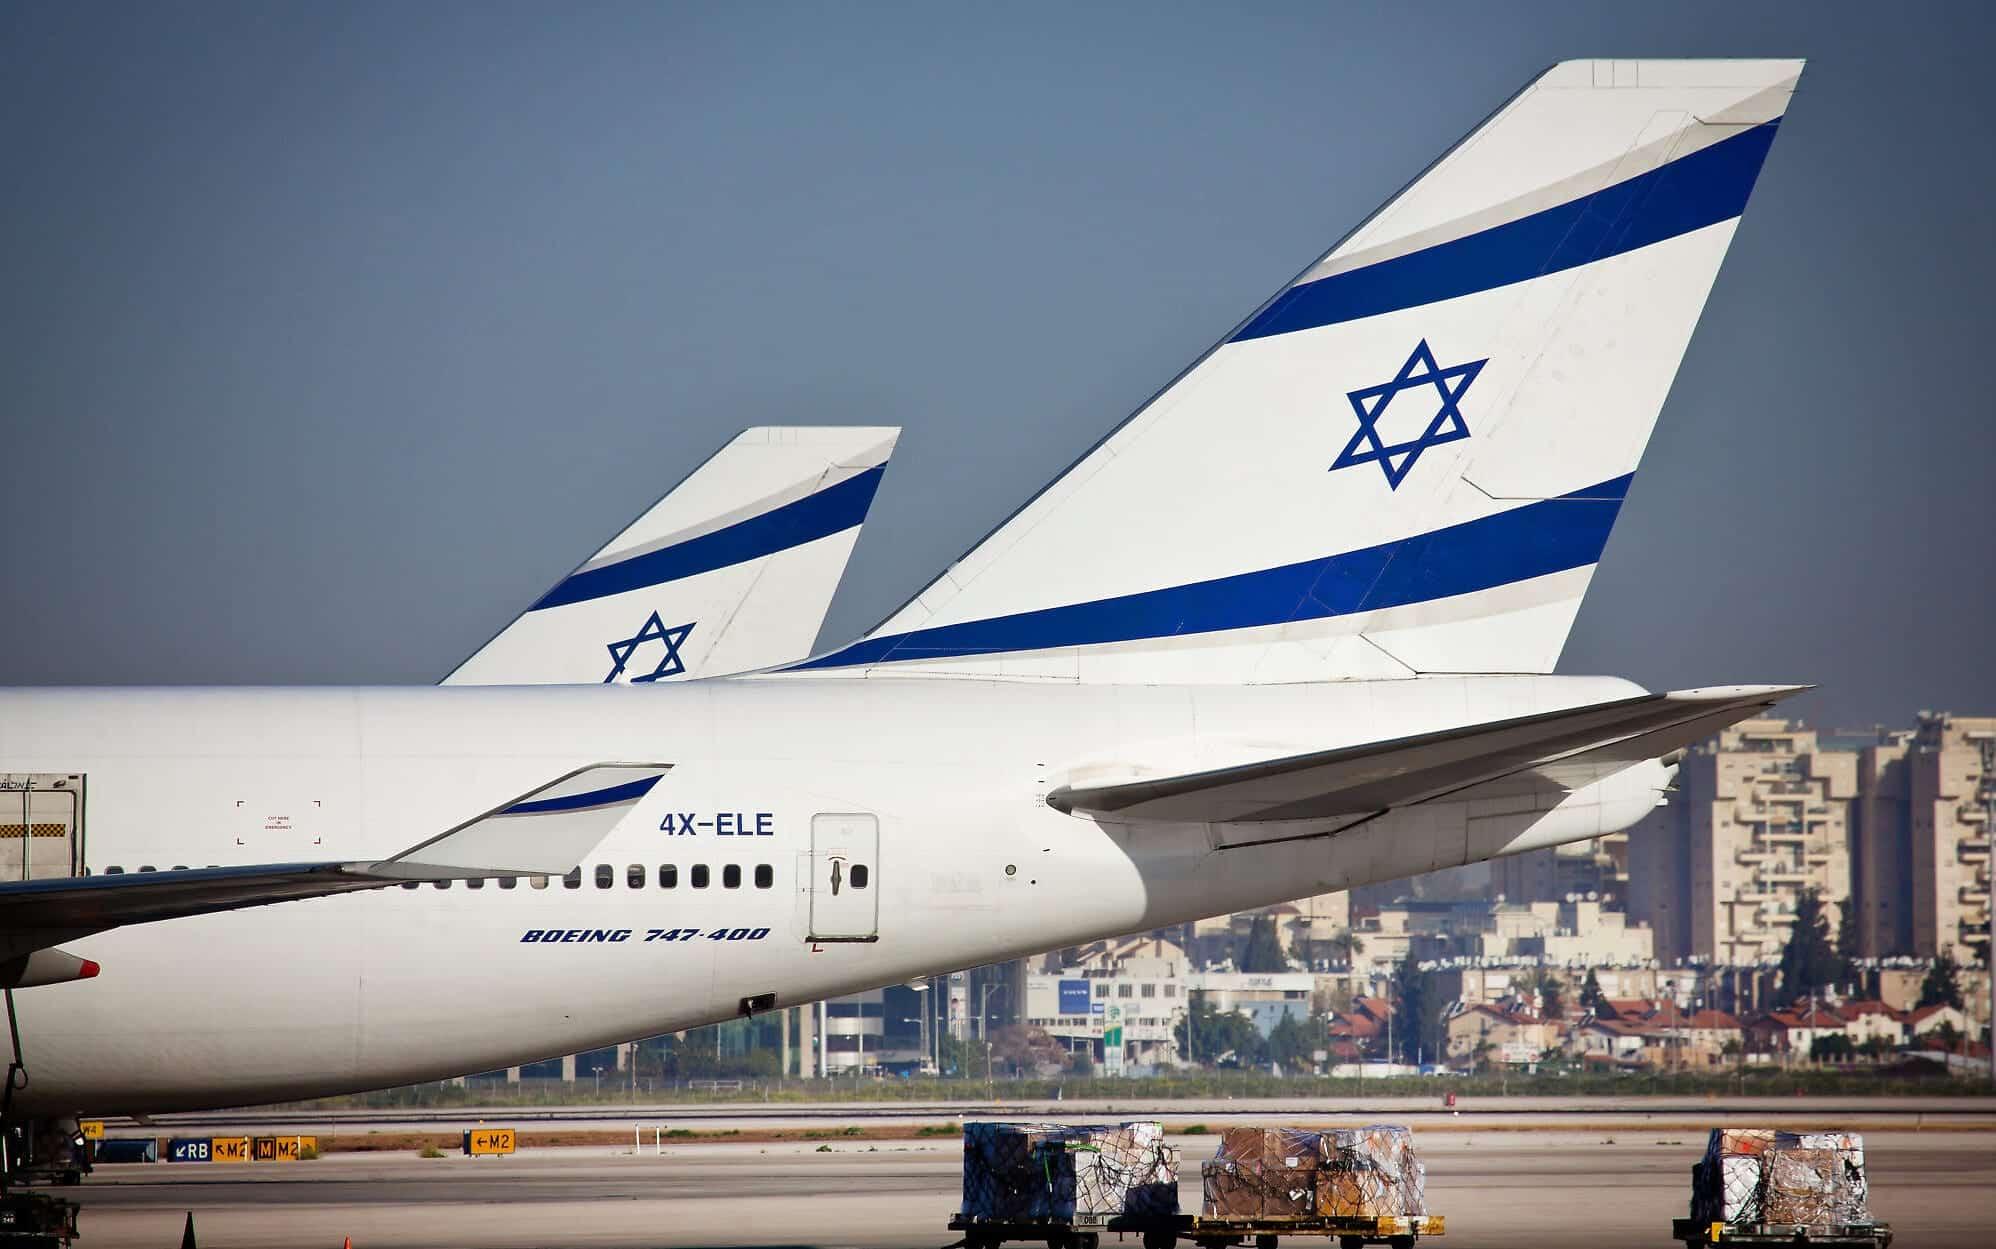 Самолеты компании Эль Аль в аэропорту Бен-Гурион фото